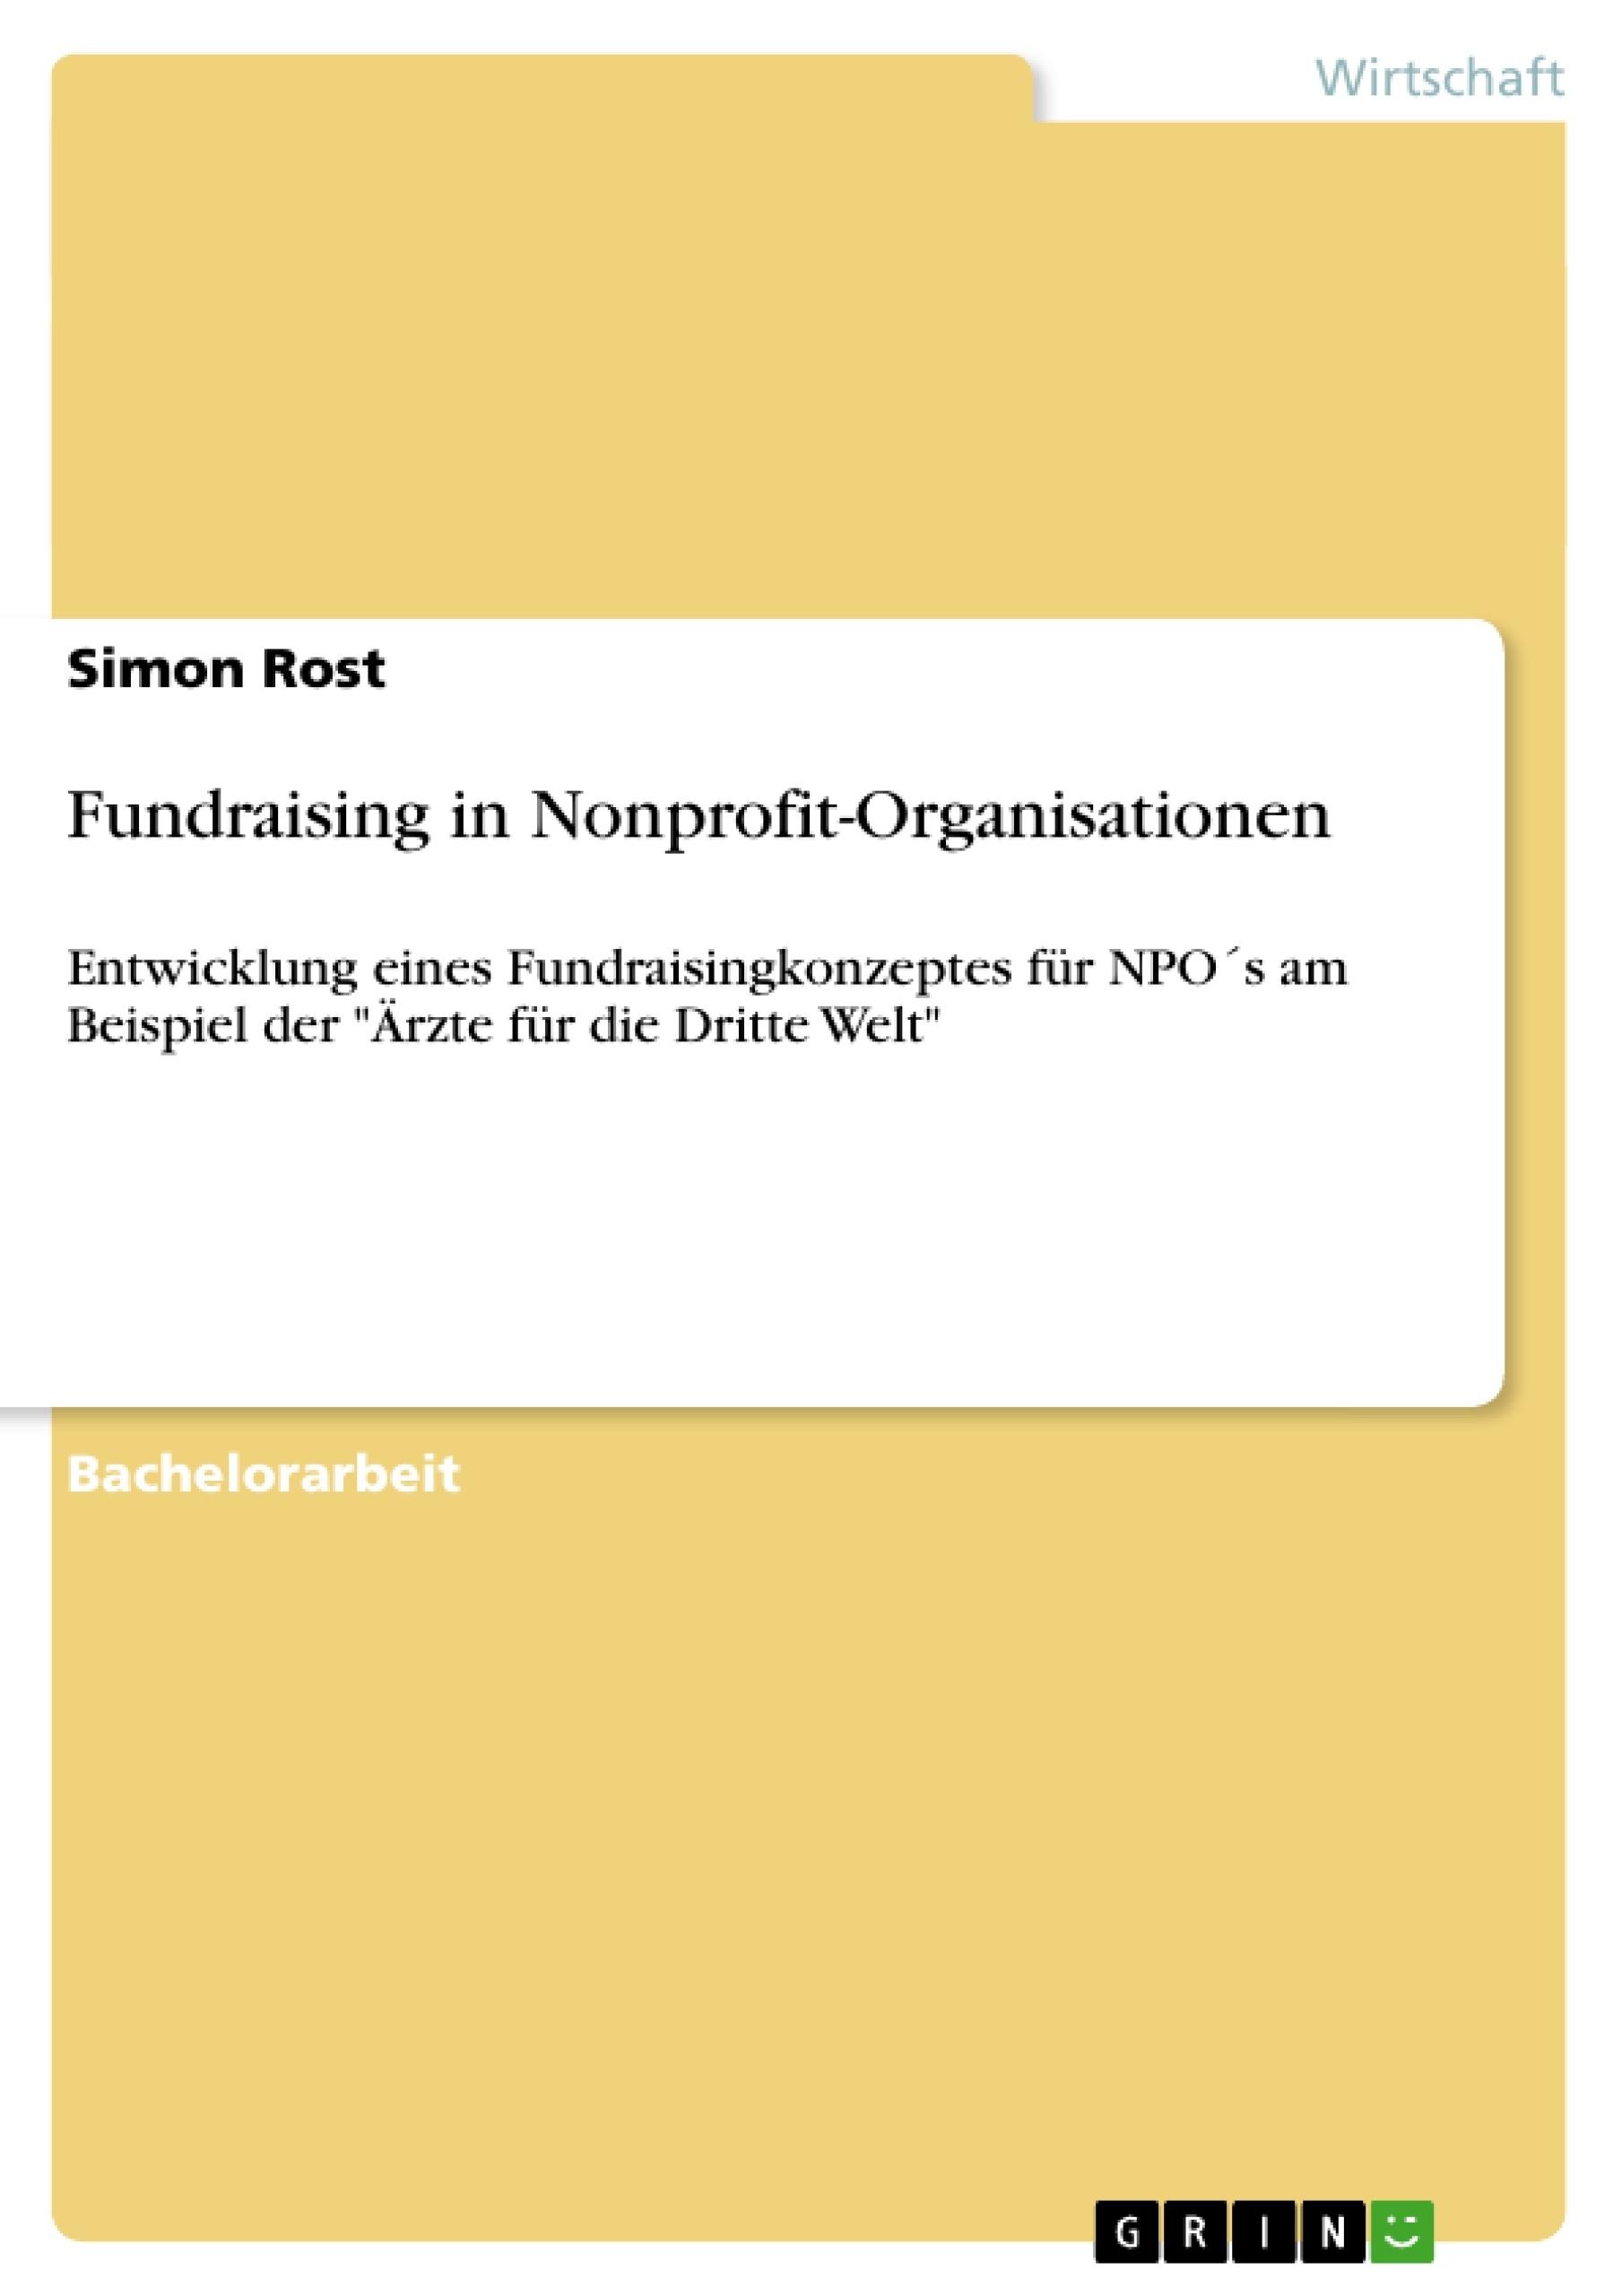 Titel: Fundraising in Nonprofit-Organisationen